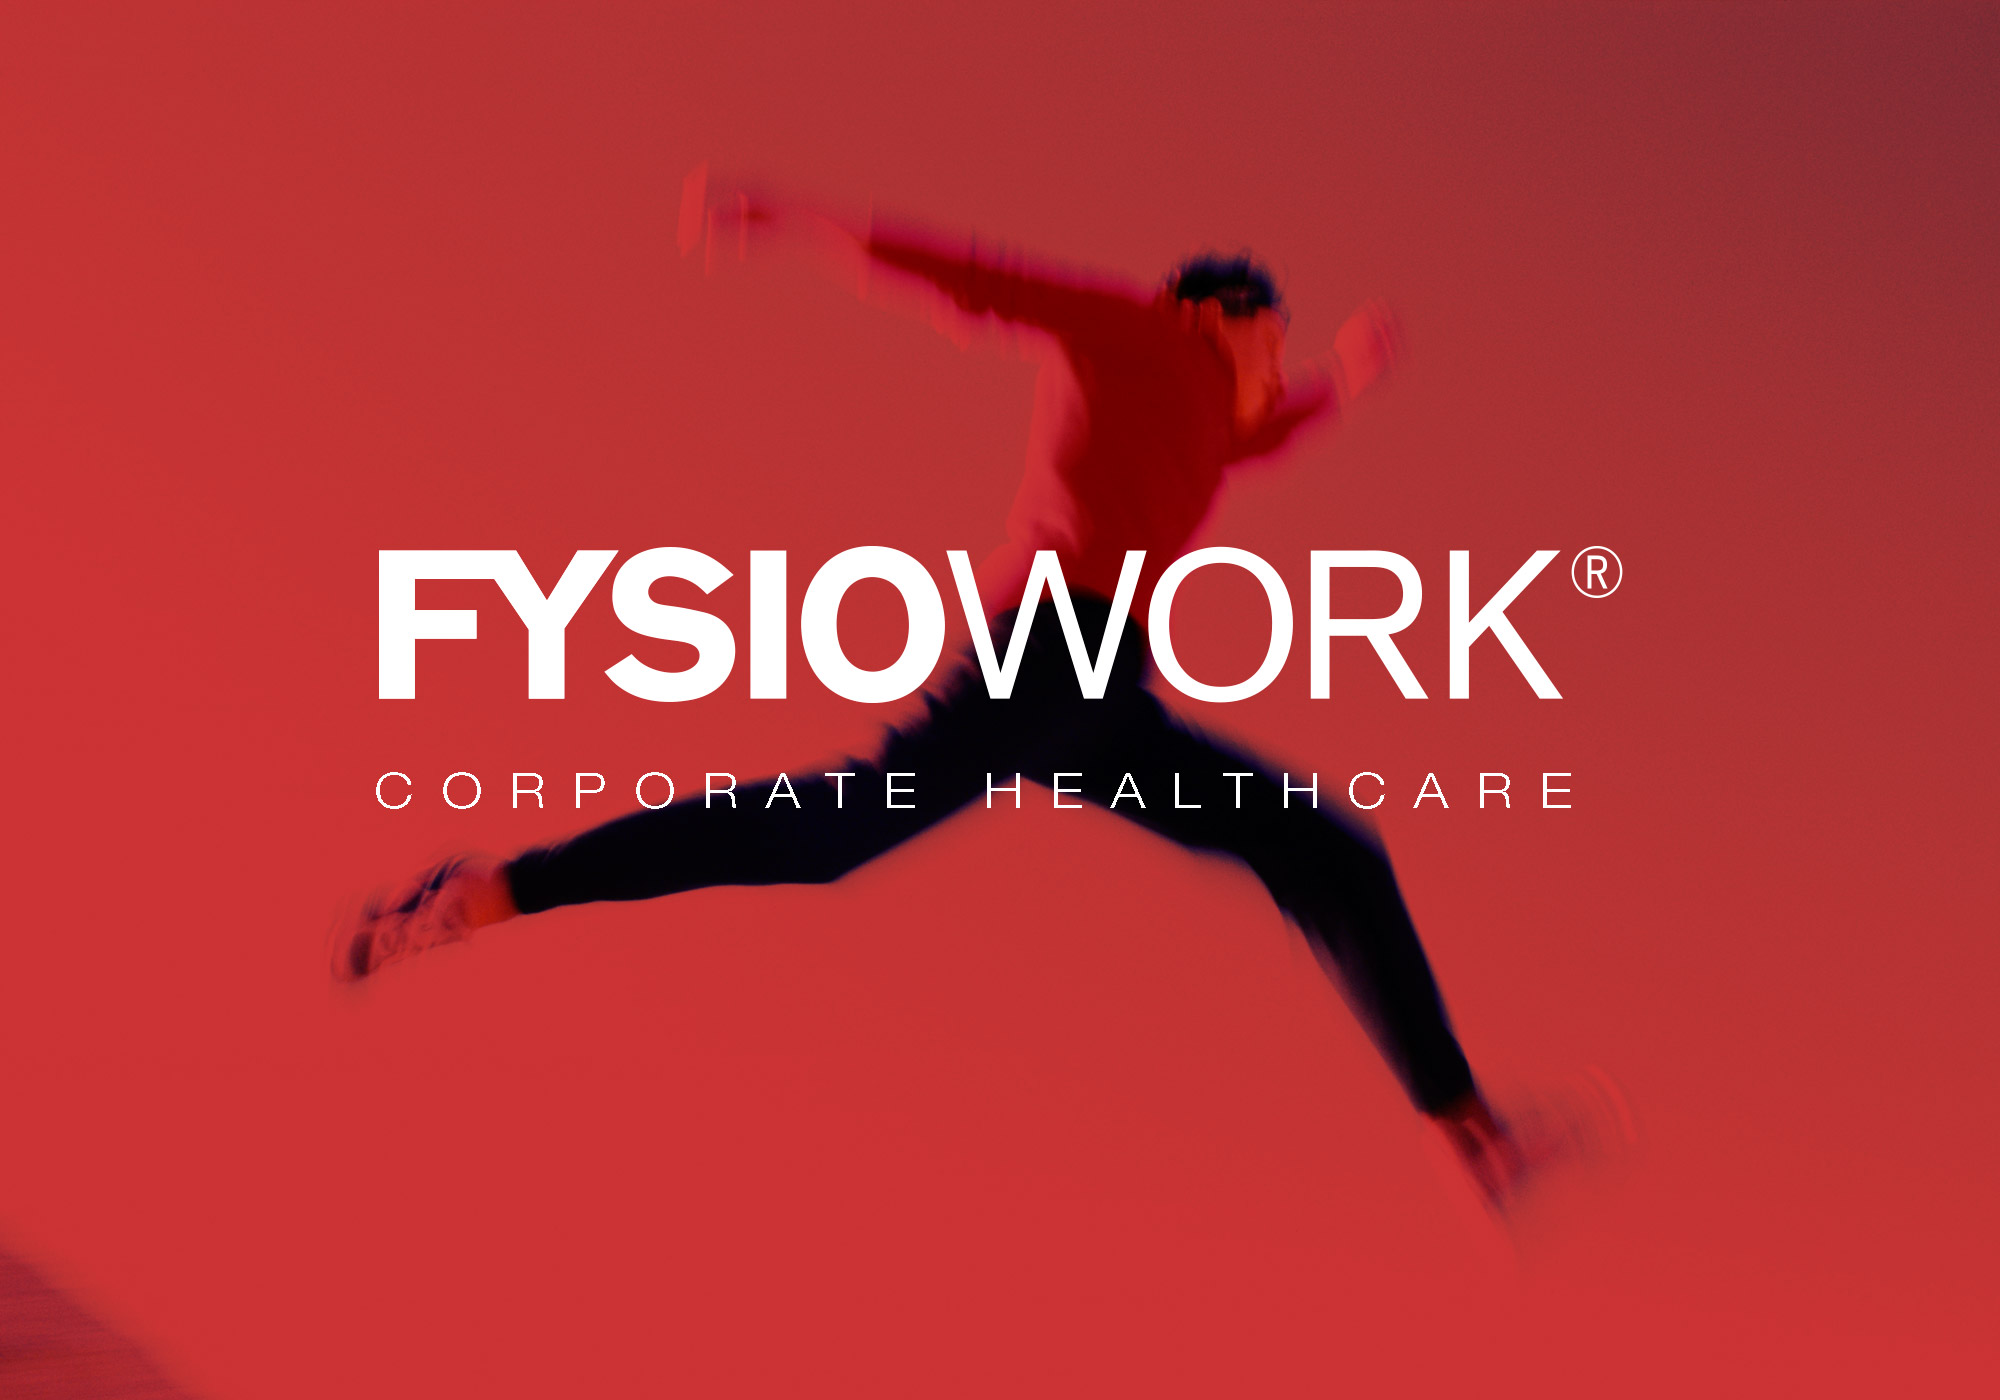 Fysiowork-visual.jpg